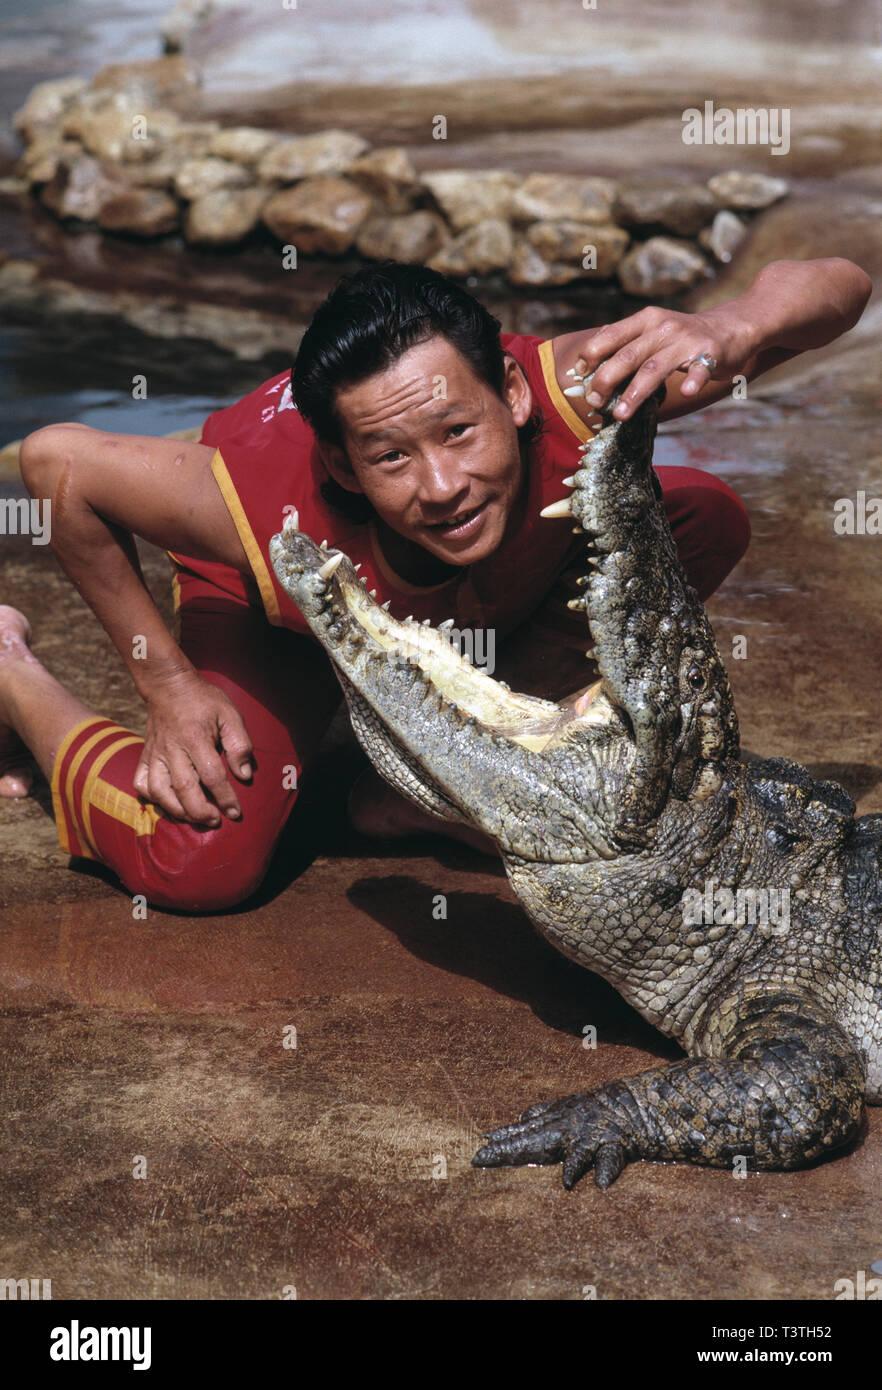 Thailand. Bangkok. Samut Prakan Crocodile Farm. Man putting his head into Crocodile's jaws - Stock Image